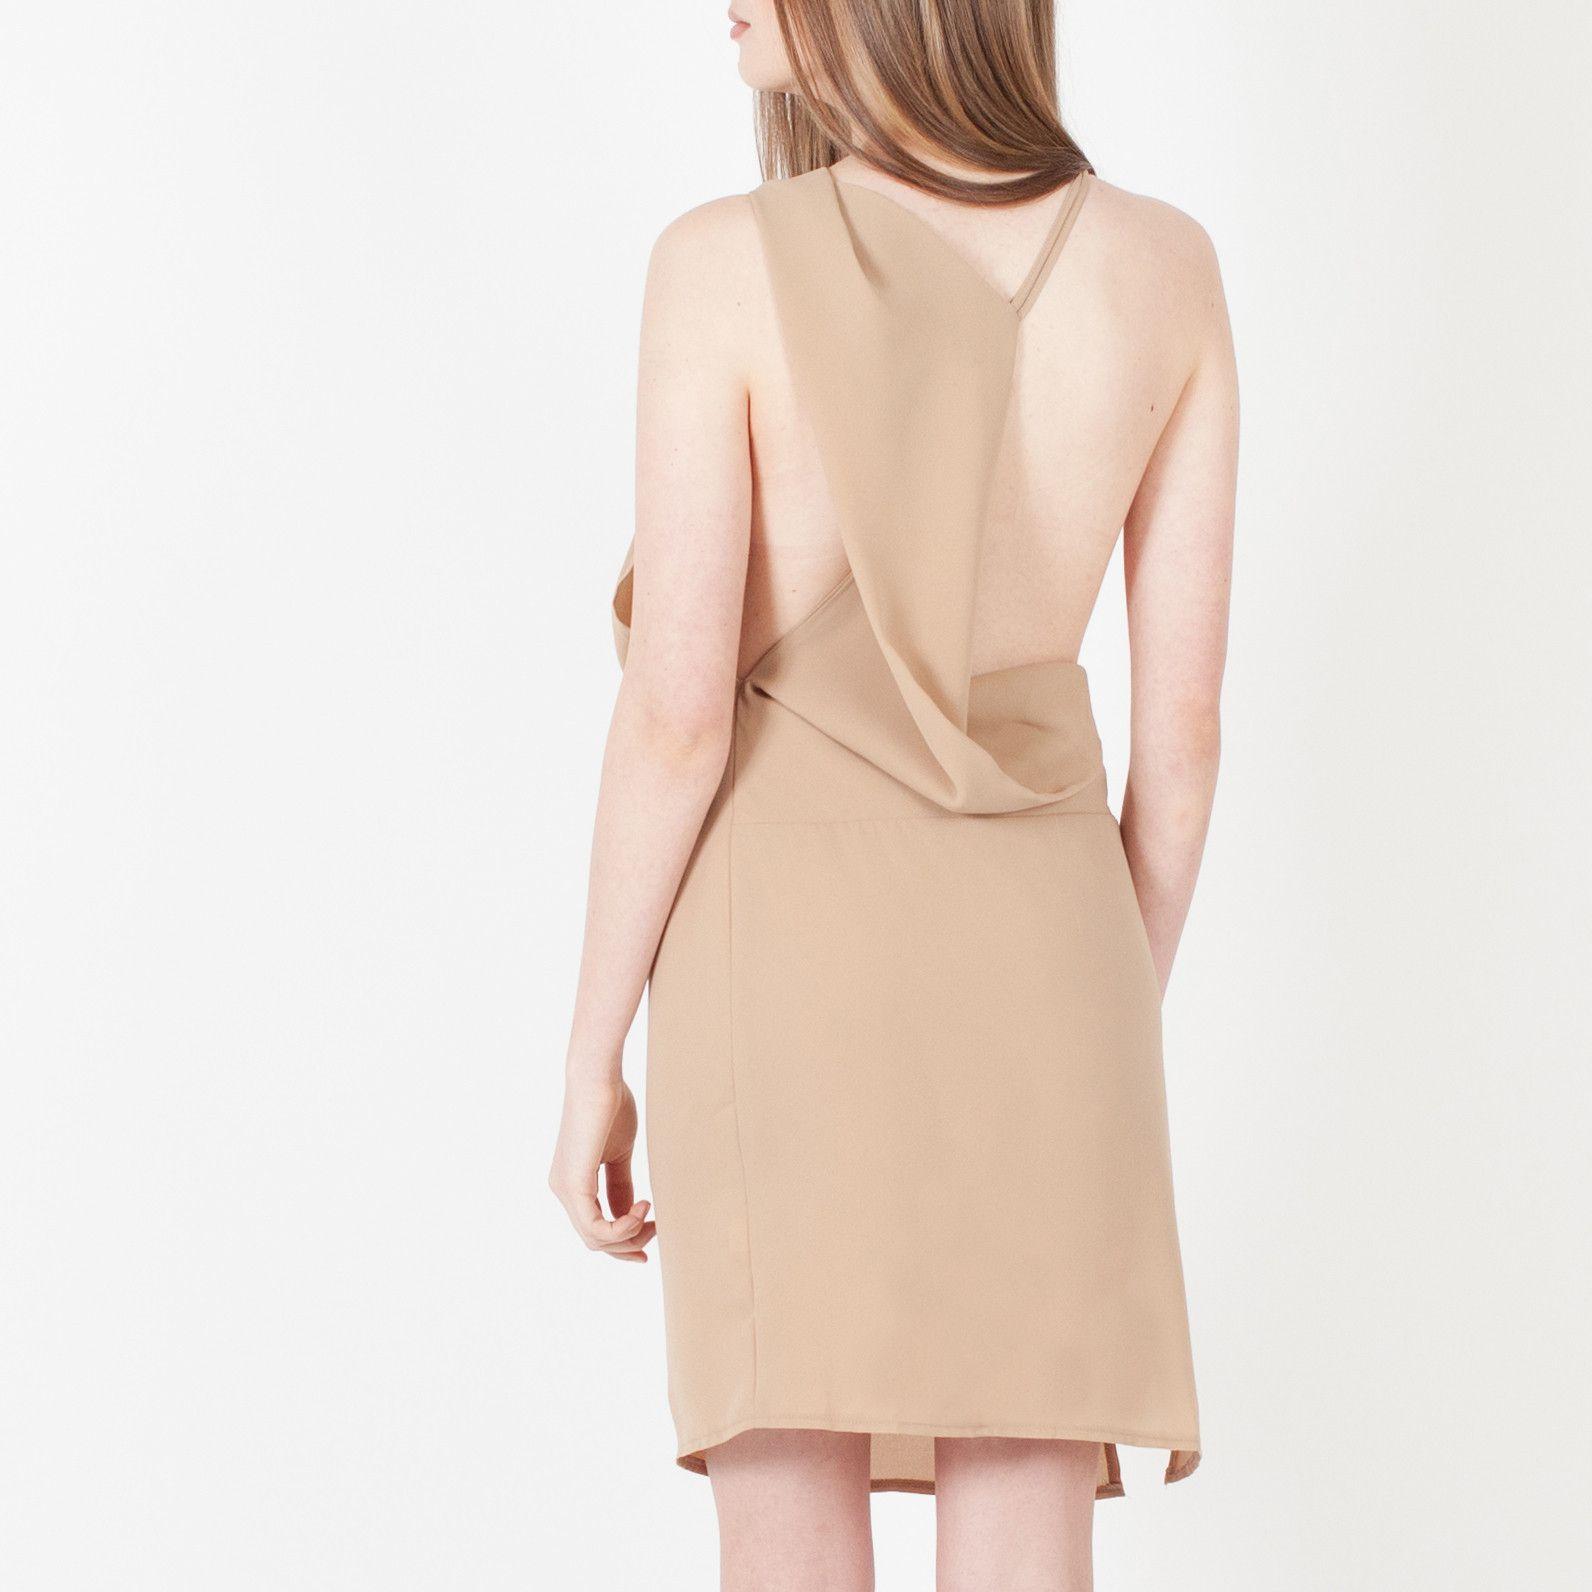 Modern Citizen  |  Celeste Open Back Dress (Beige) $49